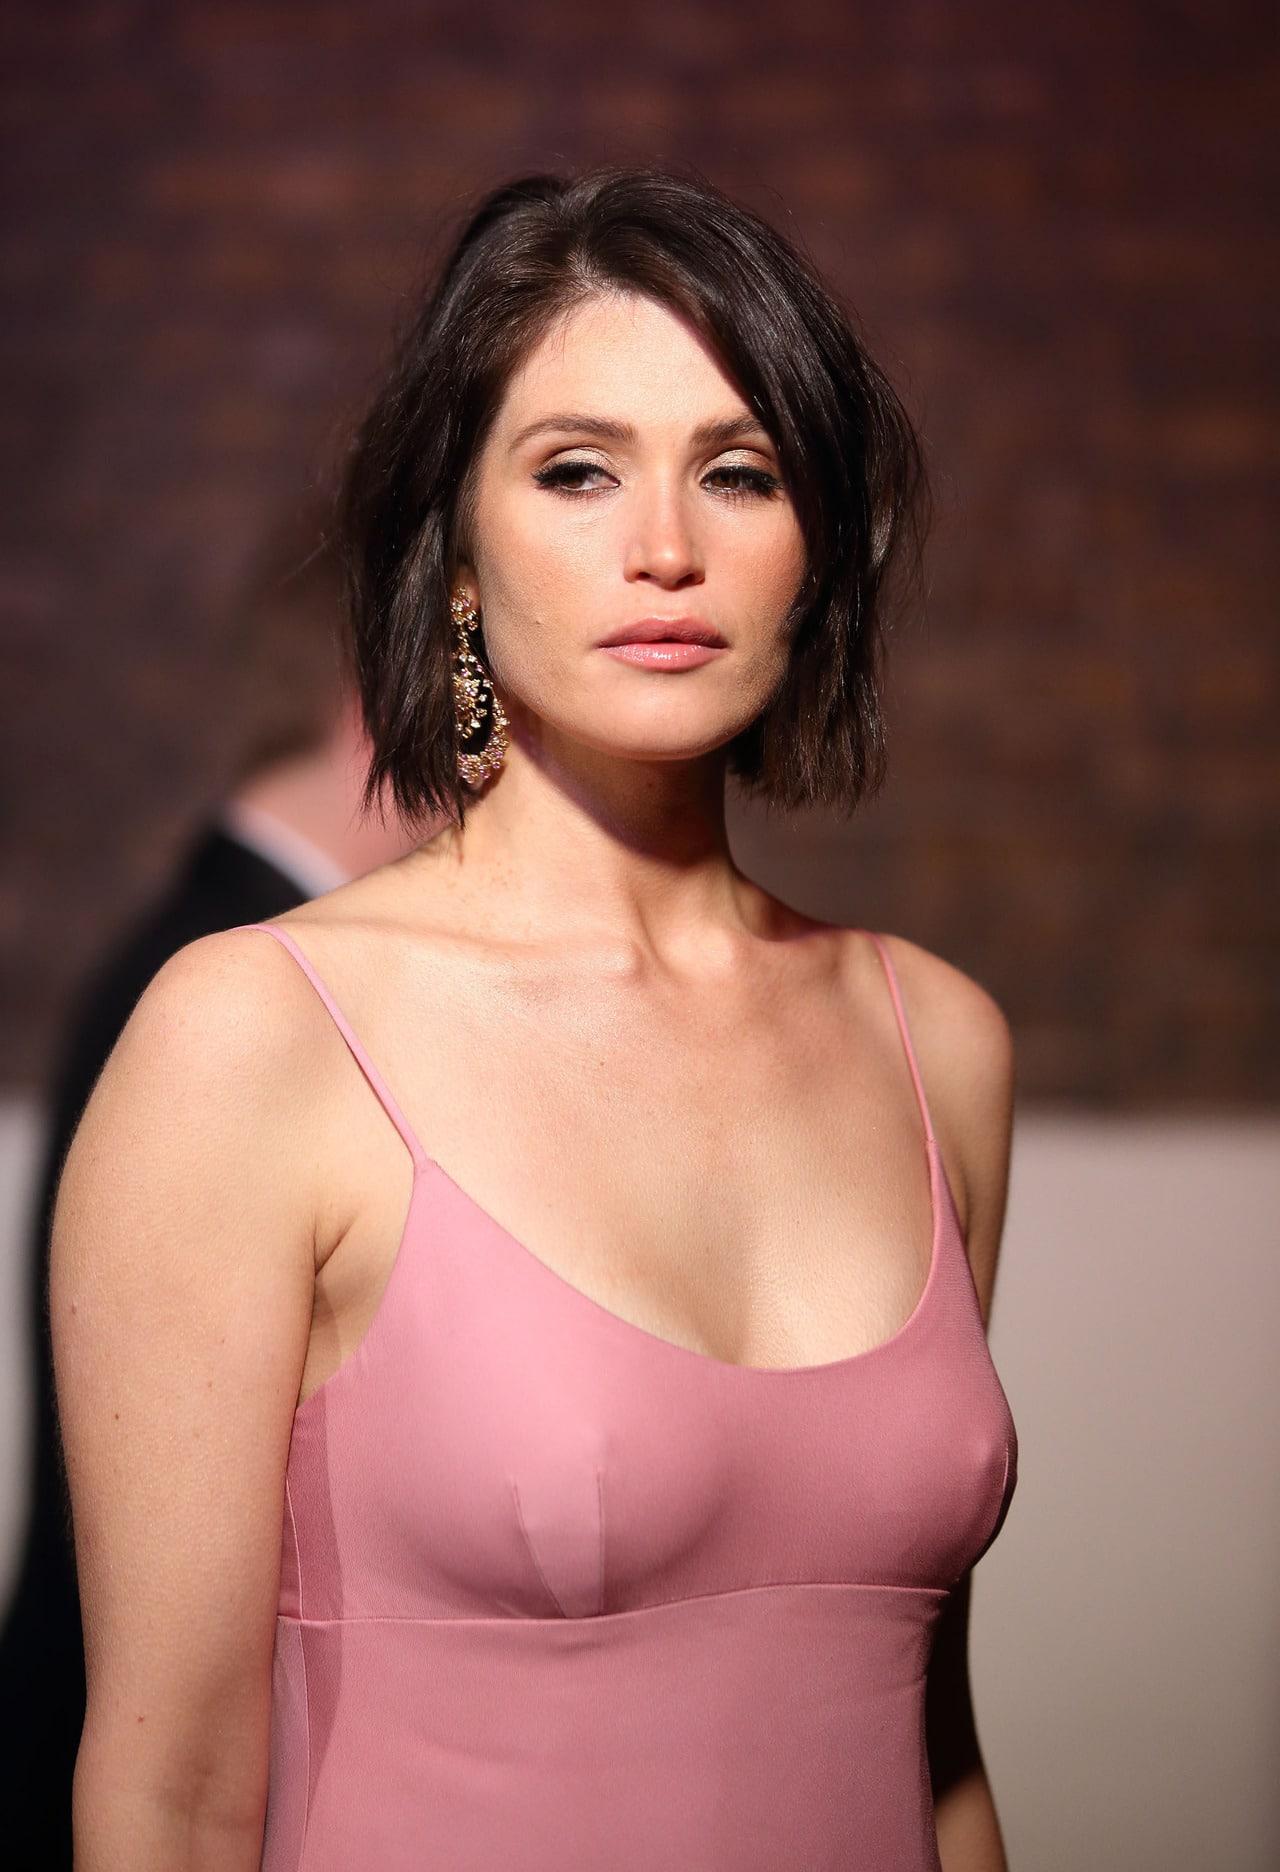 Gemma Arterton Nude Pics & Movie Scenes! - Leaked Pie